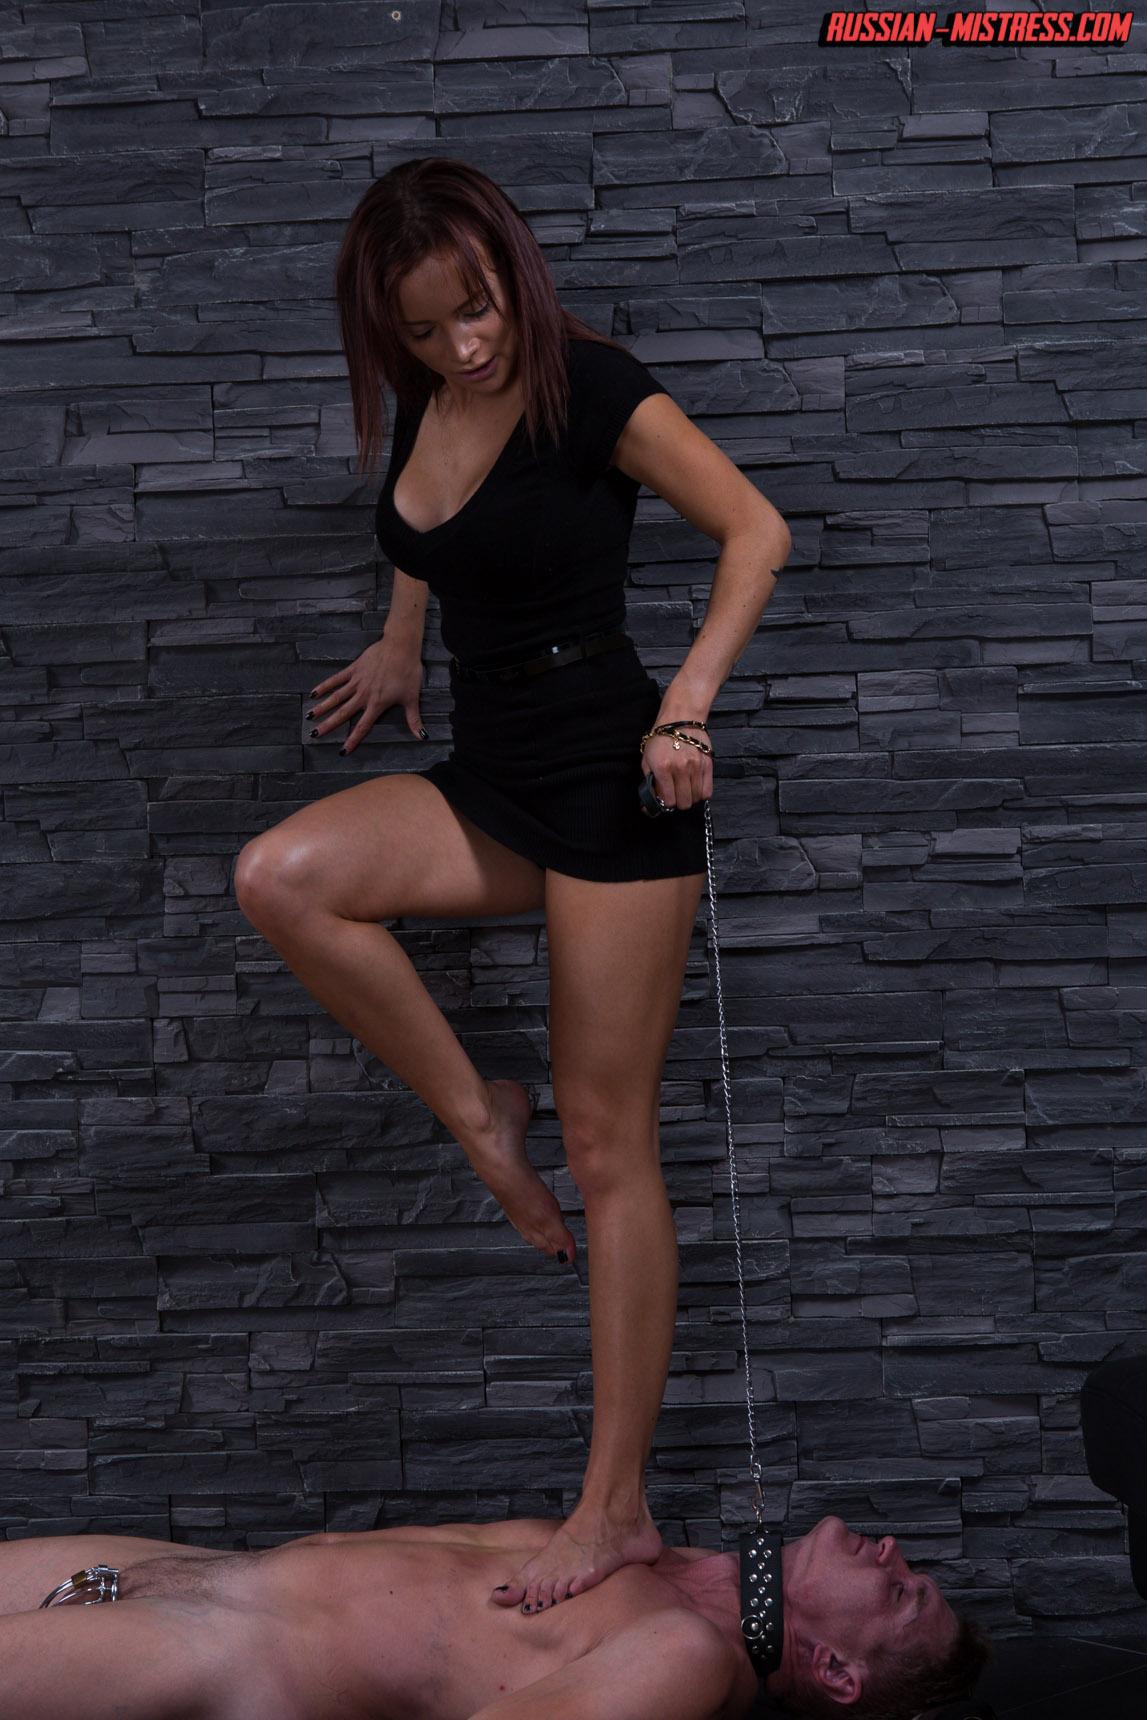 http://russianmistress.femdomworld.com/226/01/pics/img14.jpg